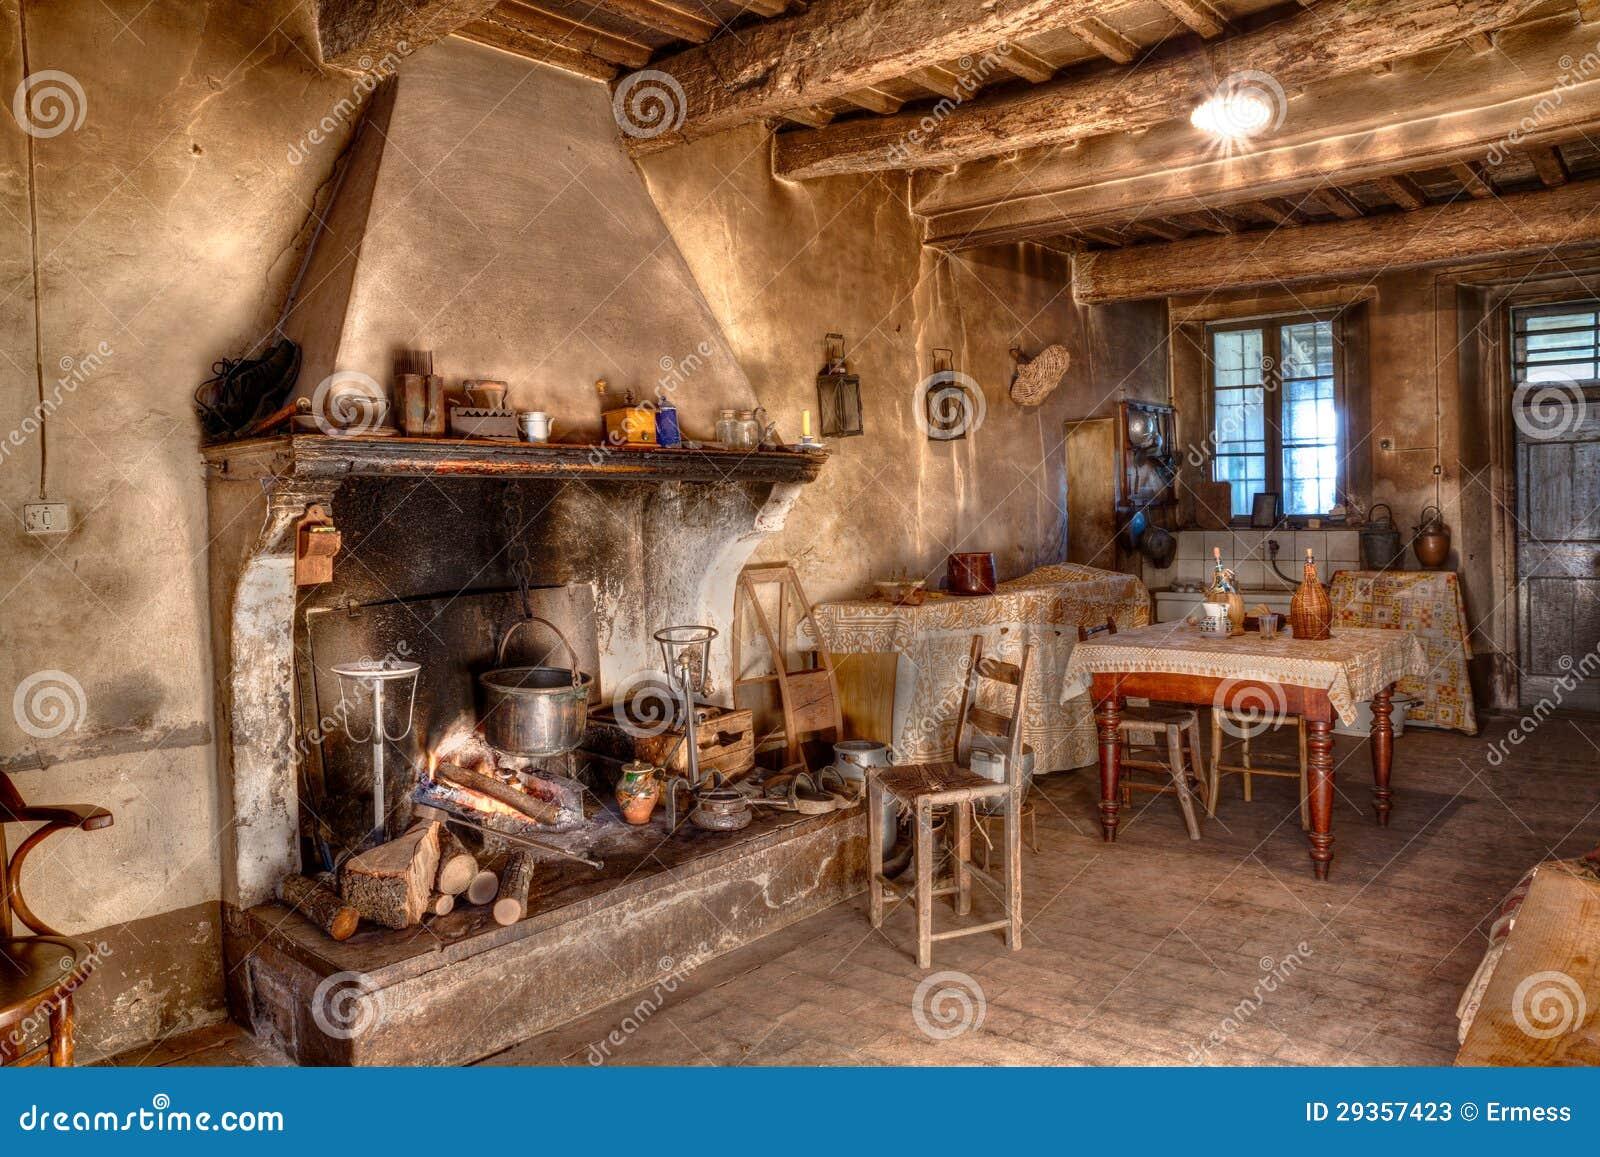 wallpaper for kitchens ireland